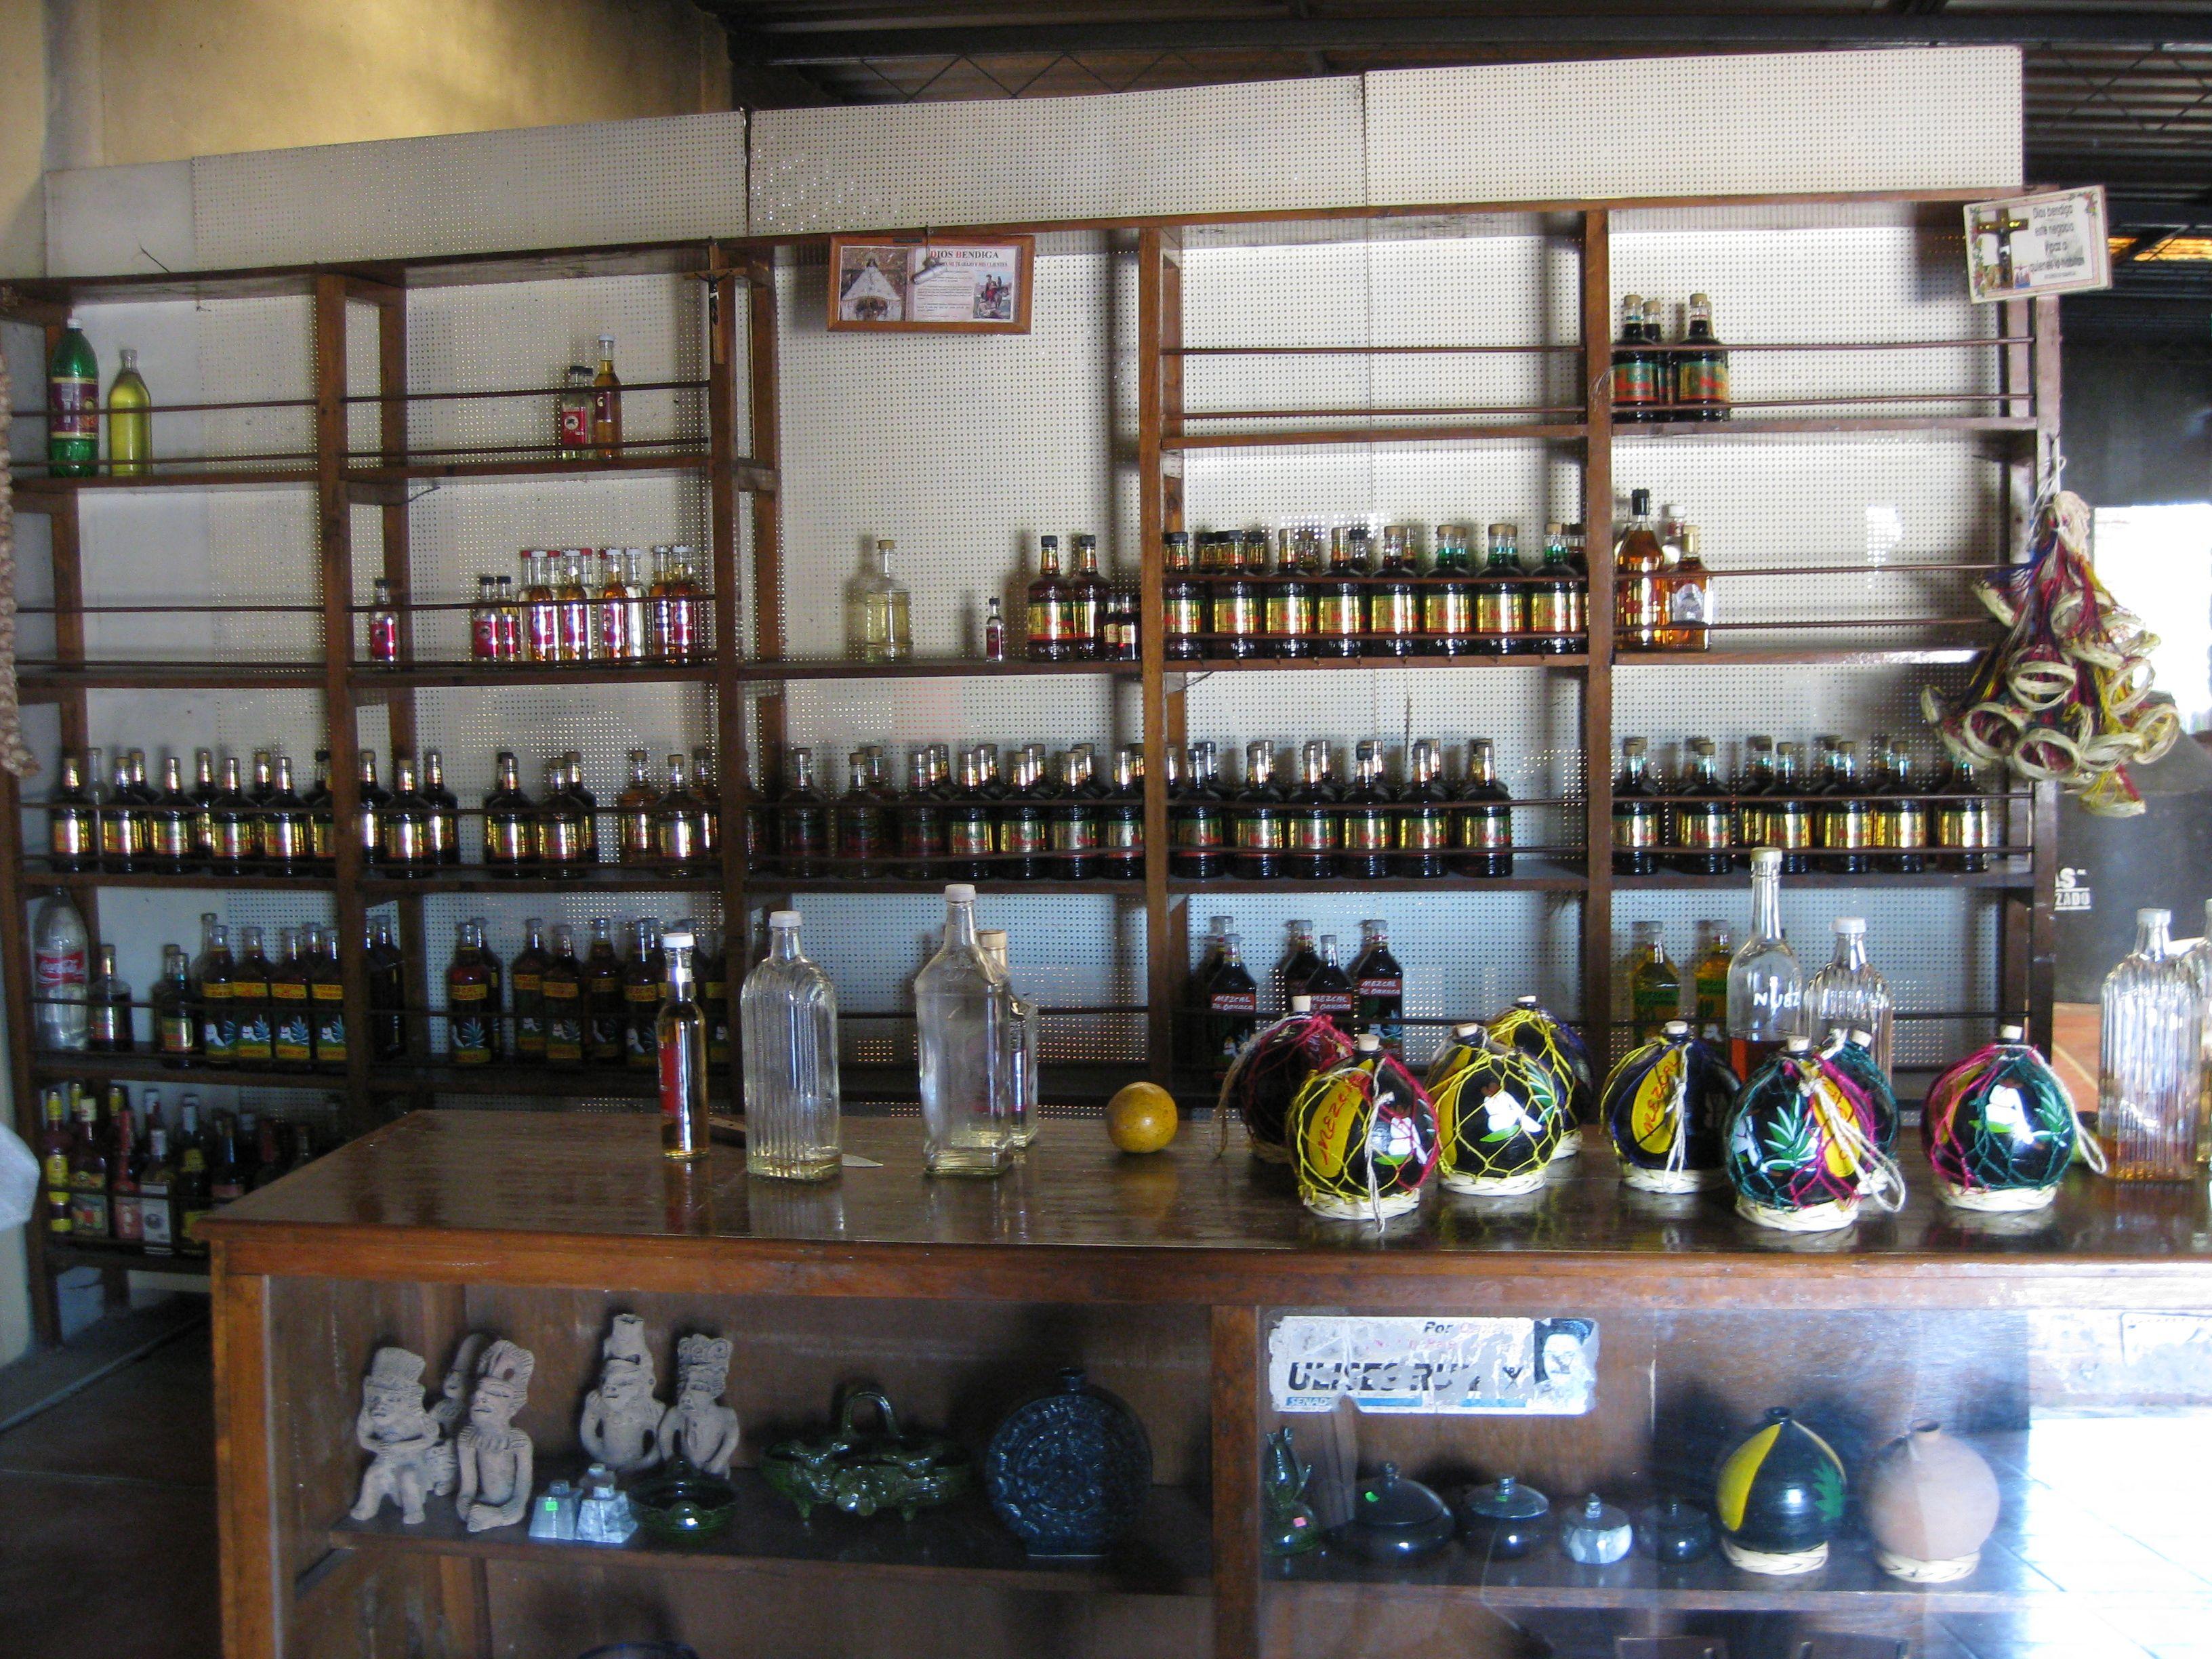 A fabric de Mezcal in Oaxaca